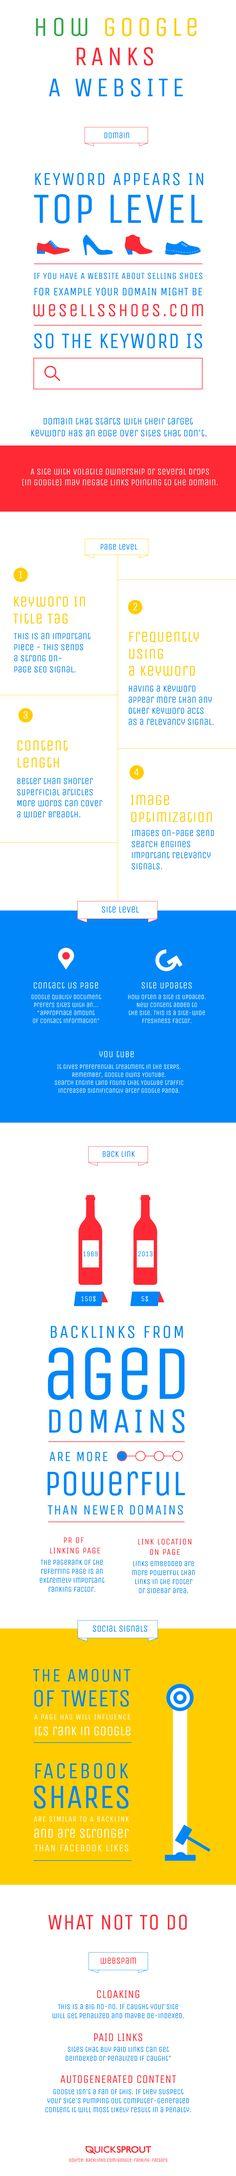 How Google Ranks A Website #SEO #Google #Infographic